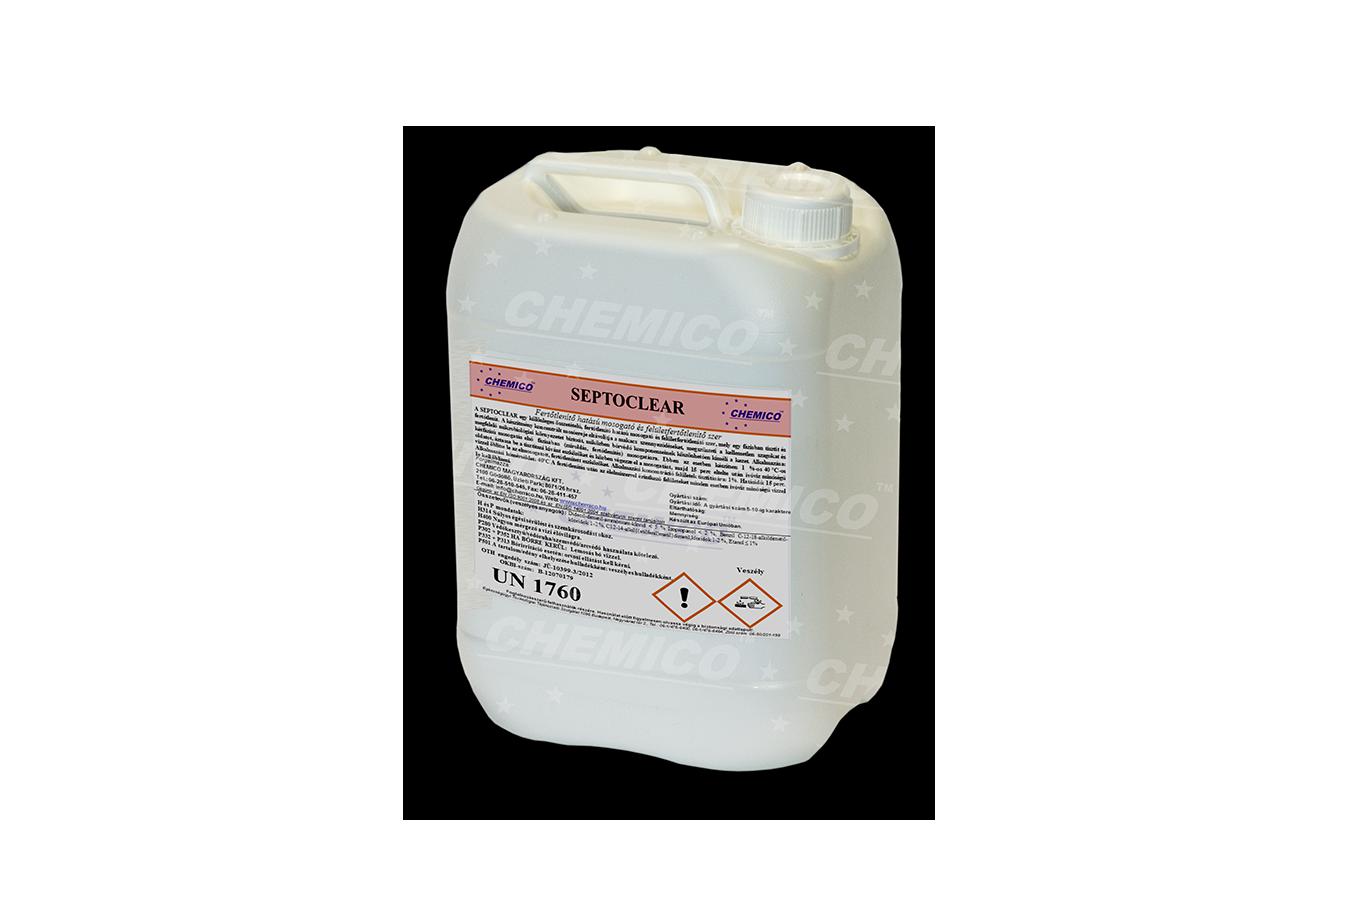 septoclear-fertotlenito-tisztito-zsiroldo-semleges-mosogatoszer-zsirtalanito-semleges-ipari-chemico-5l